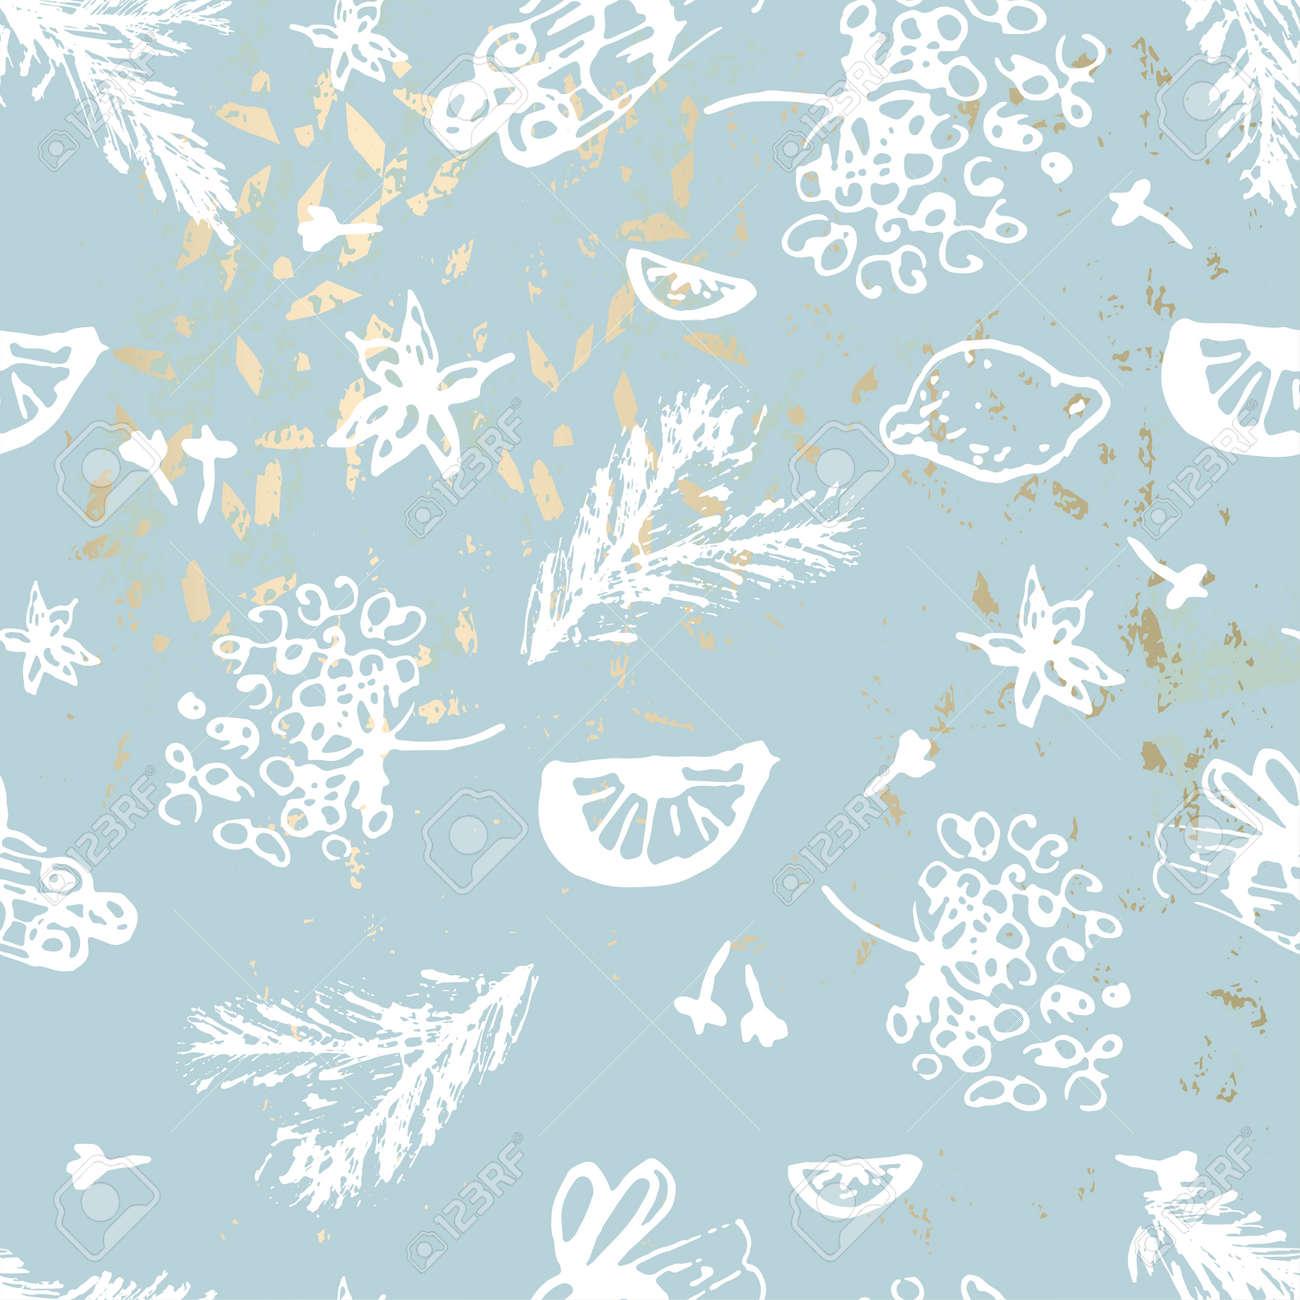 Hand Drawn Chic Winter Painting Pattern On Trendy Pastel Blush